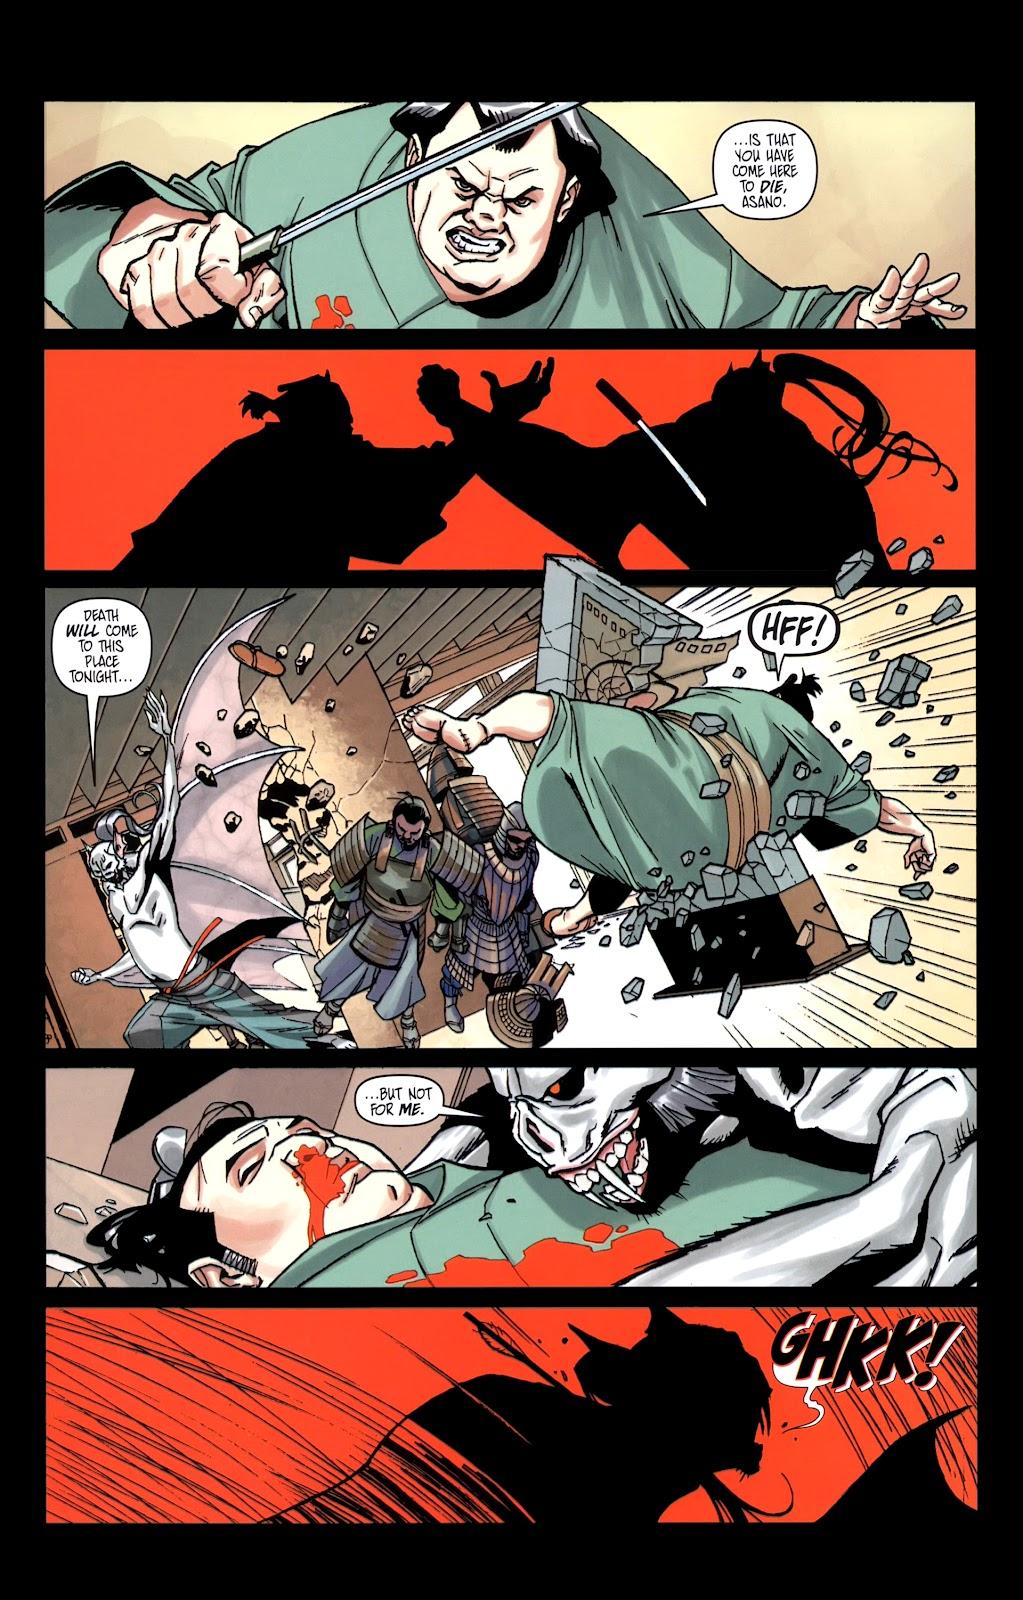 Read online Shinku comic -  Issue #5 - 5